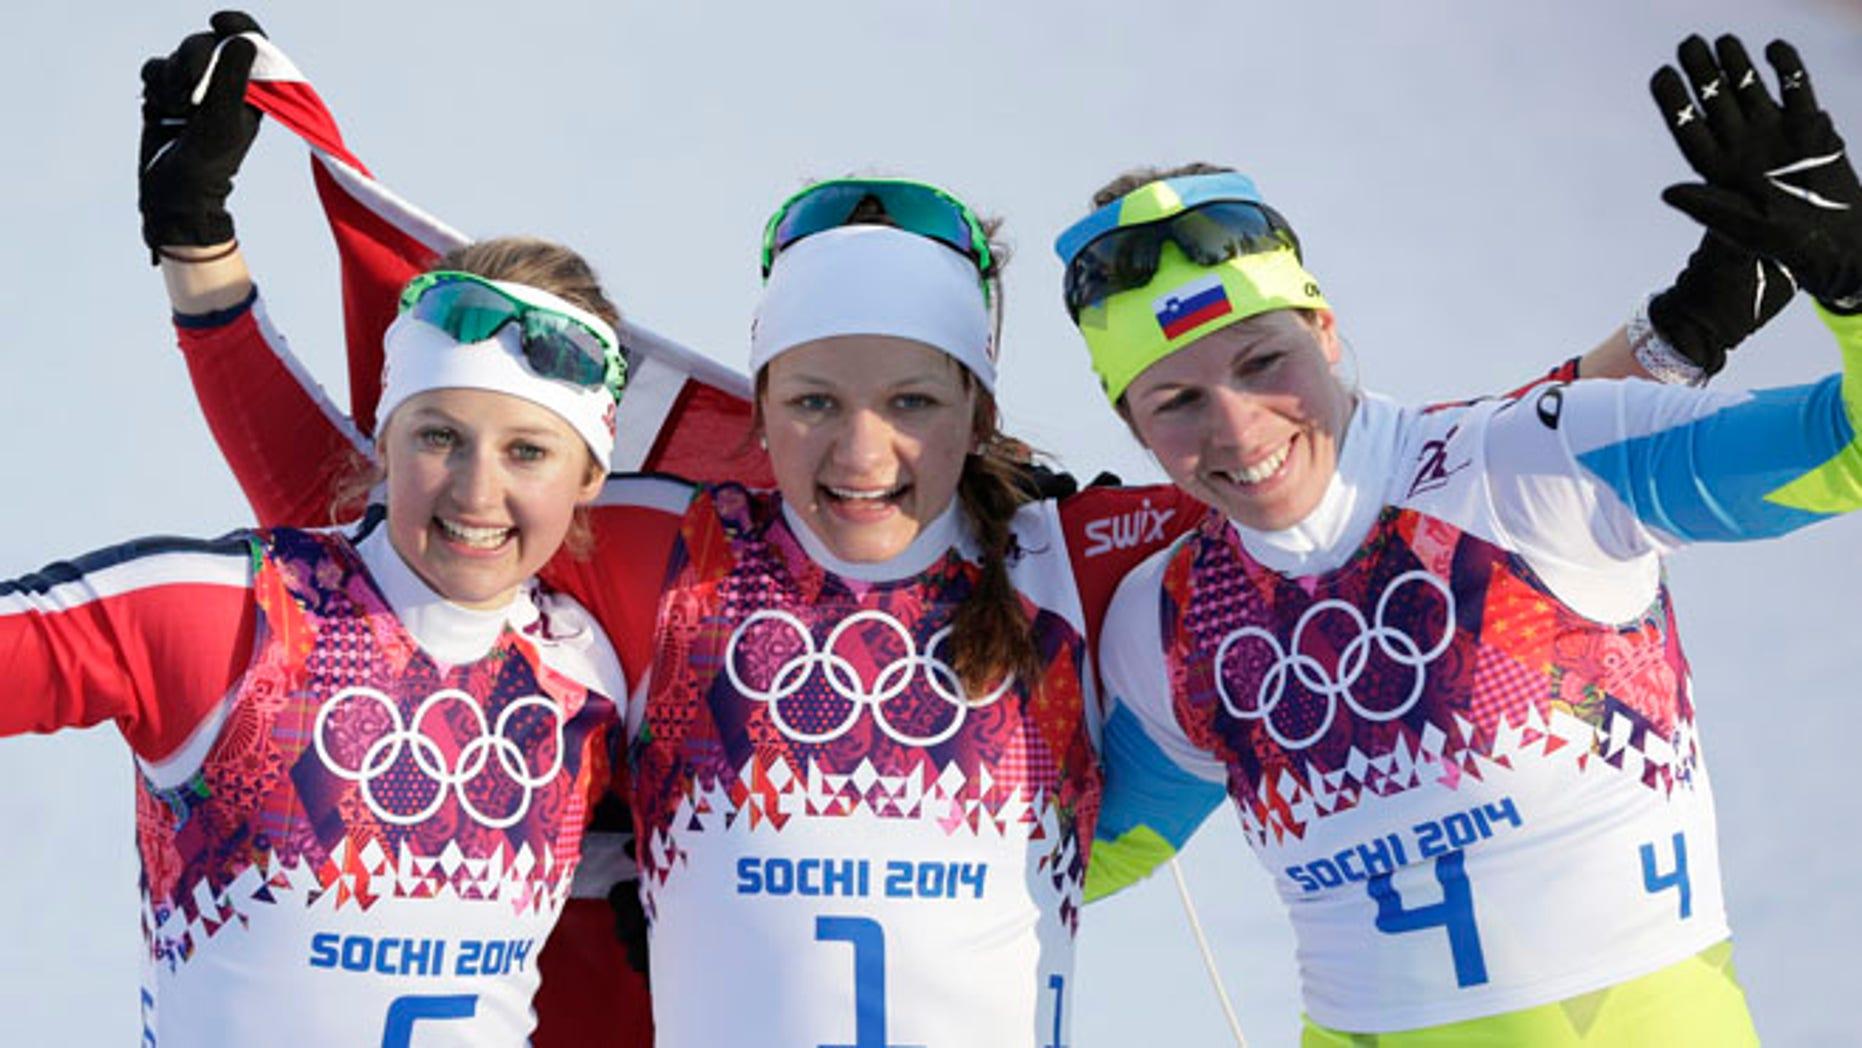 Feb. 11, 2014: Norway's gold medal winner Maiken Caspersen Falla is flanked by silver medal winner Ingvild Flugstad Oestberg from Norway, left, and Slovenia's bronze medal winner Vesna Fabjan after the women's cross-country sprint the 2014 Winter Olympics in Krasnaya Polyana, Russia.